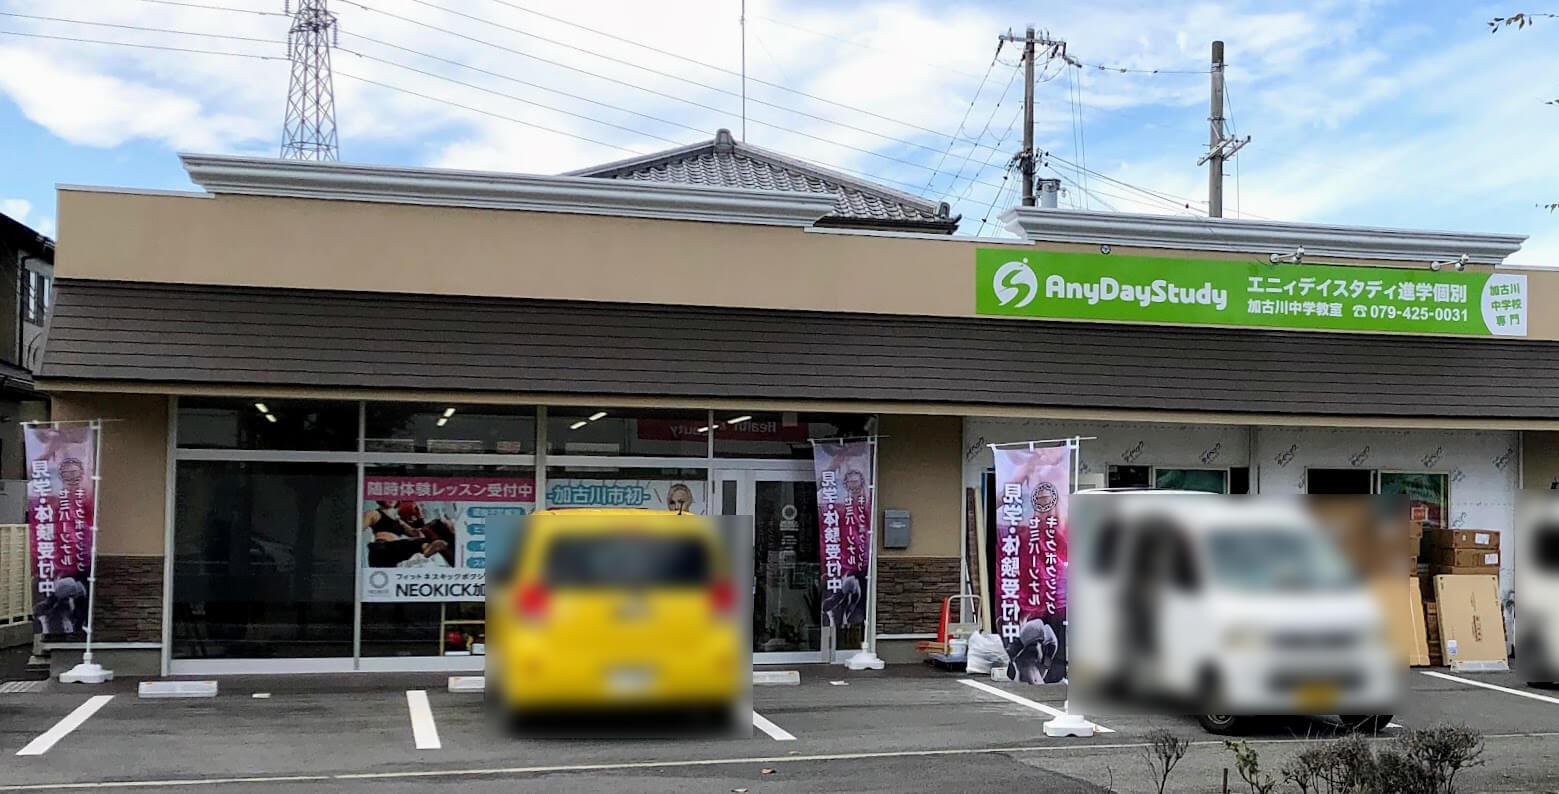 NEOKICK加古川店とエニィデイスタディ加古川中学教室